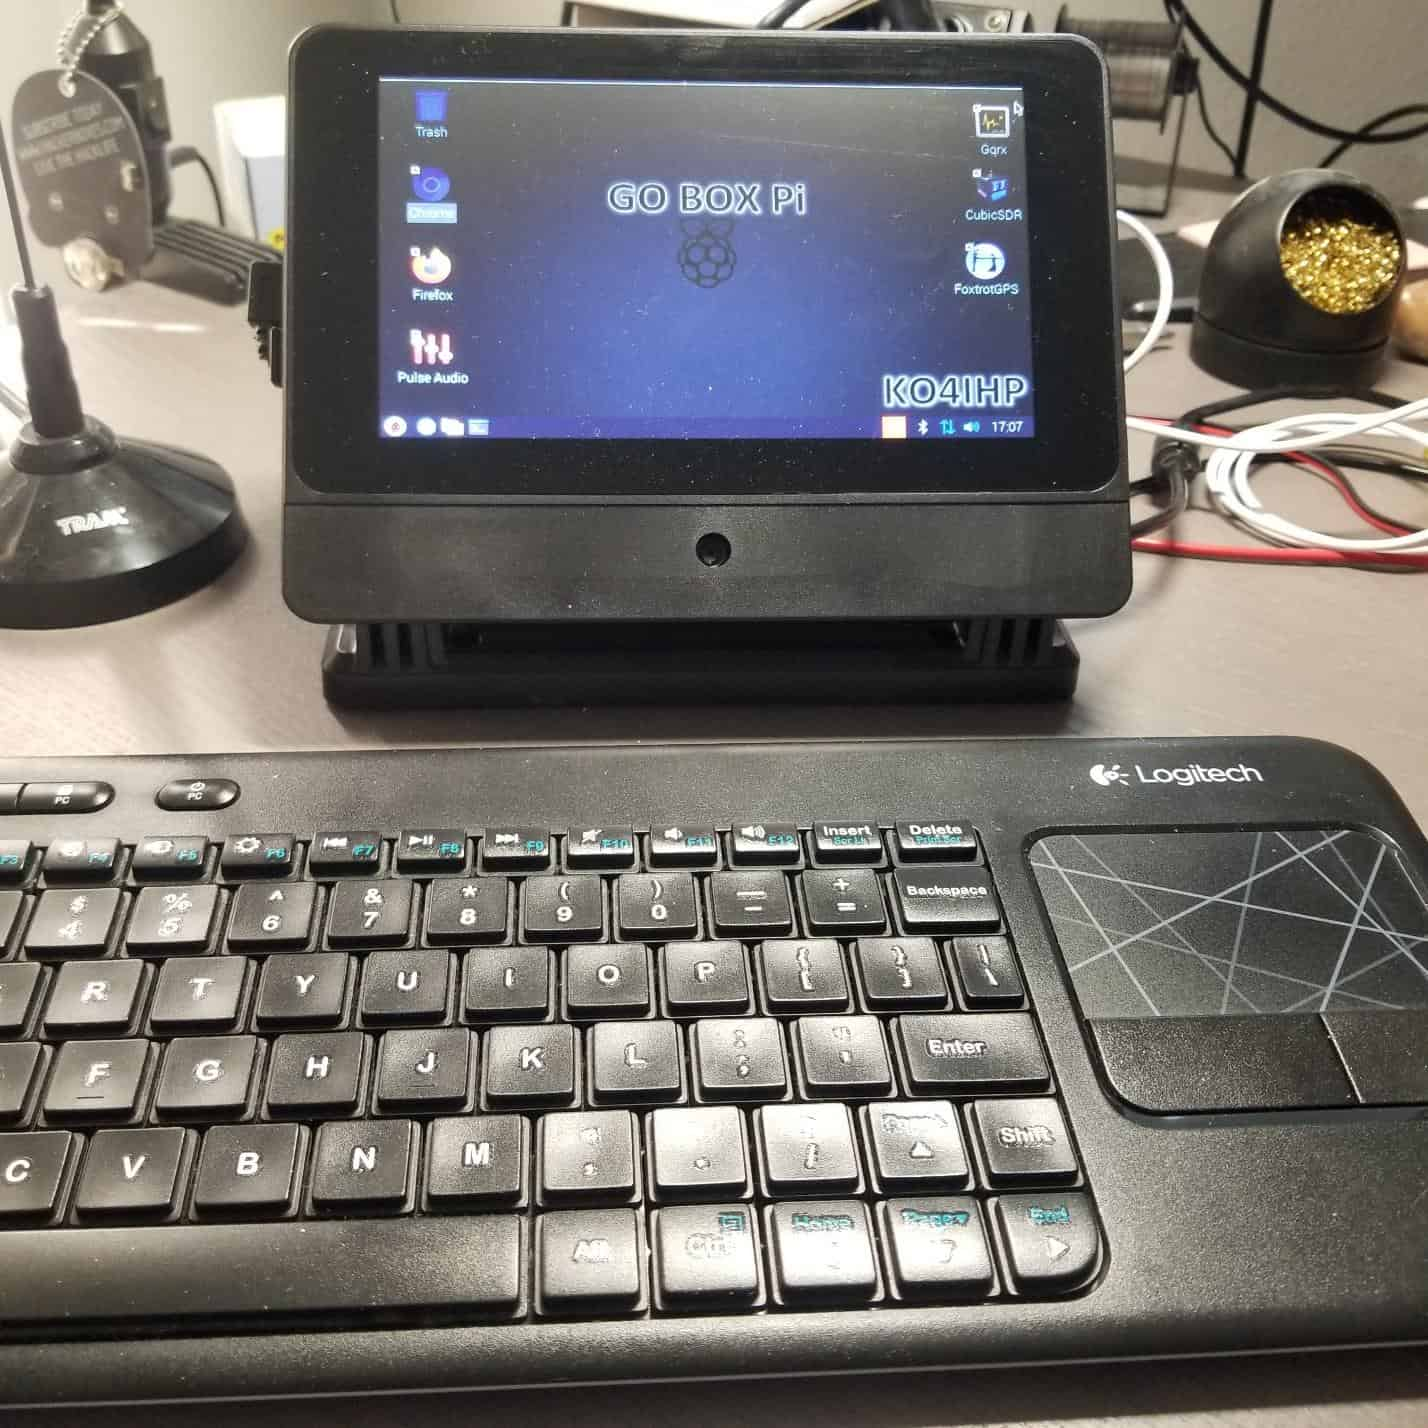 Logitech wireless keyboard with touchpad